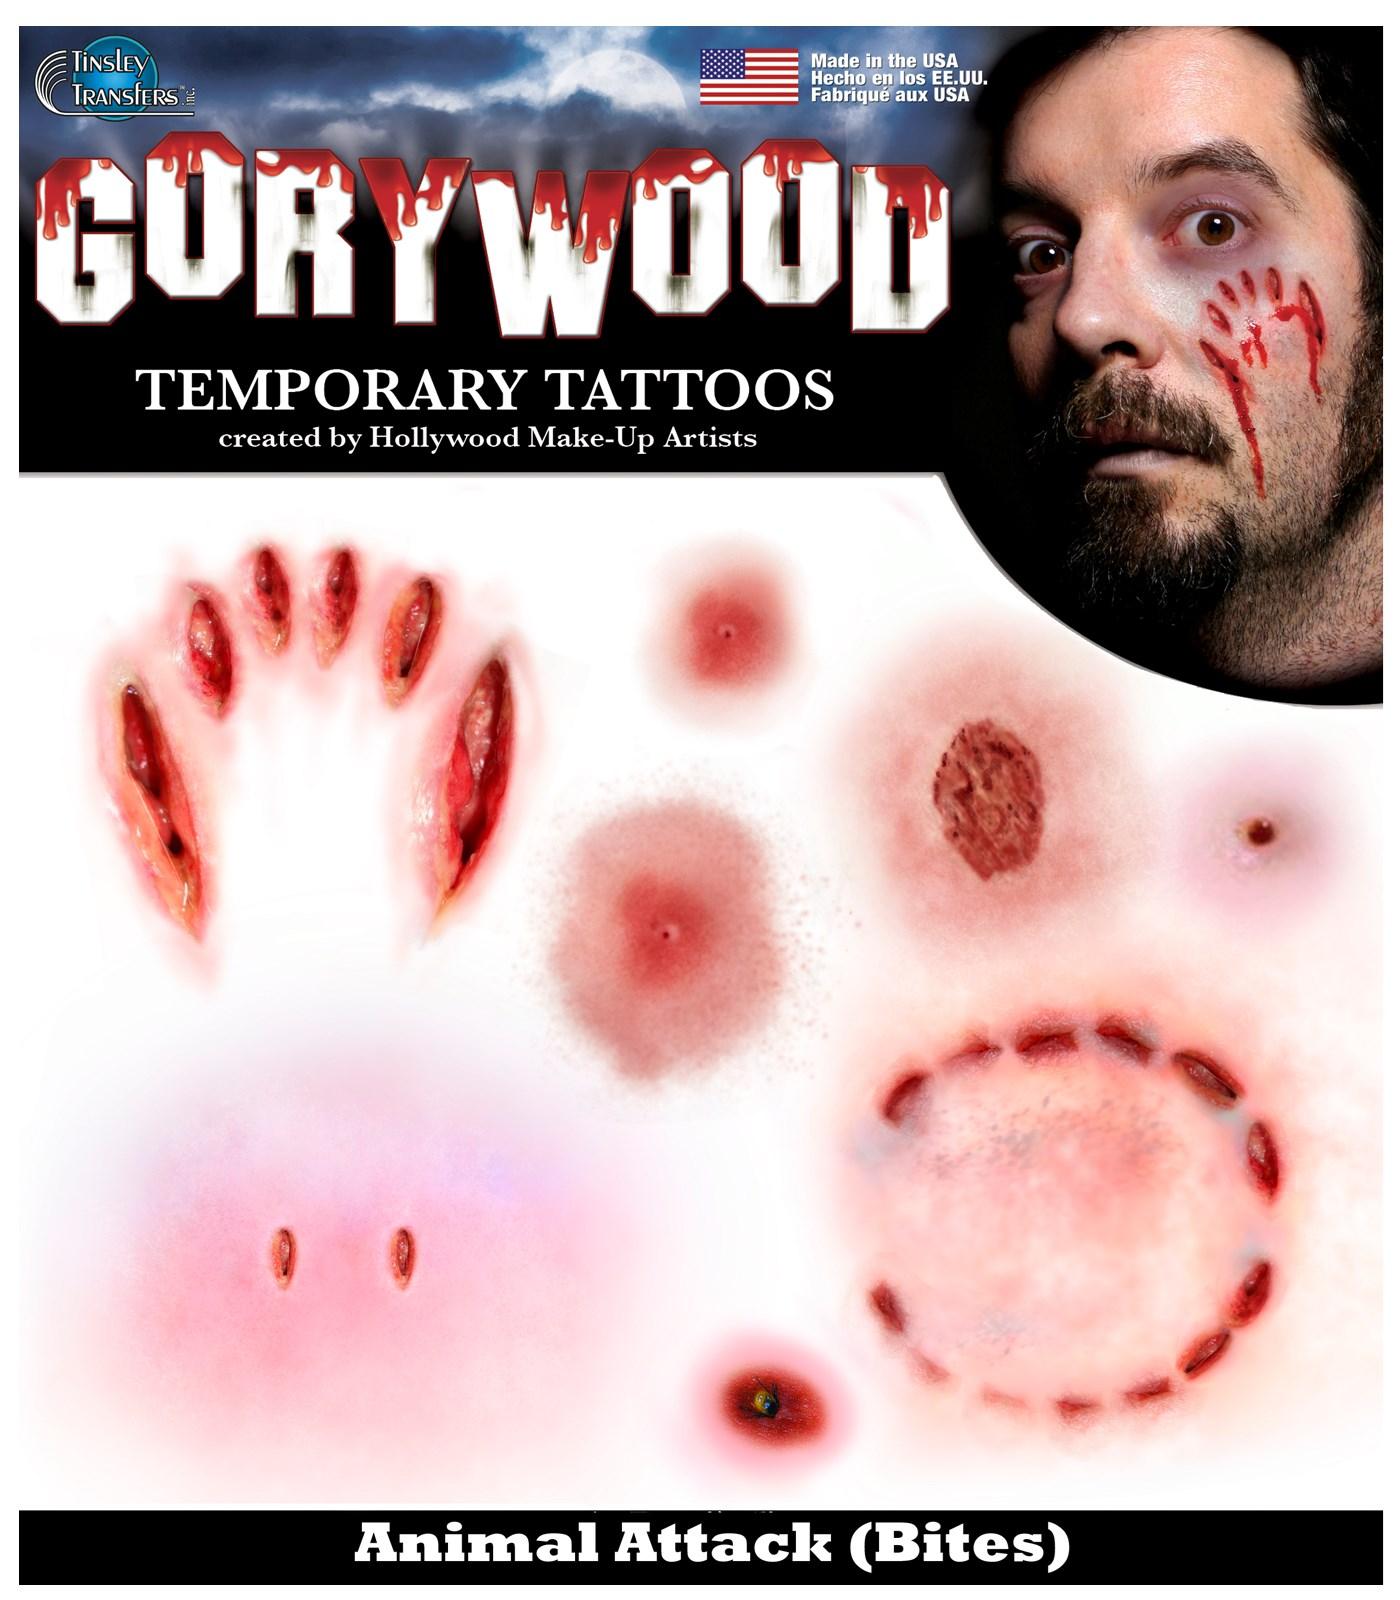 Image of Animal Attack Tattoos